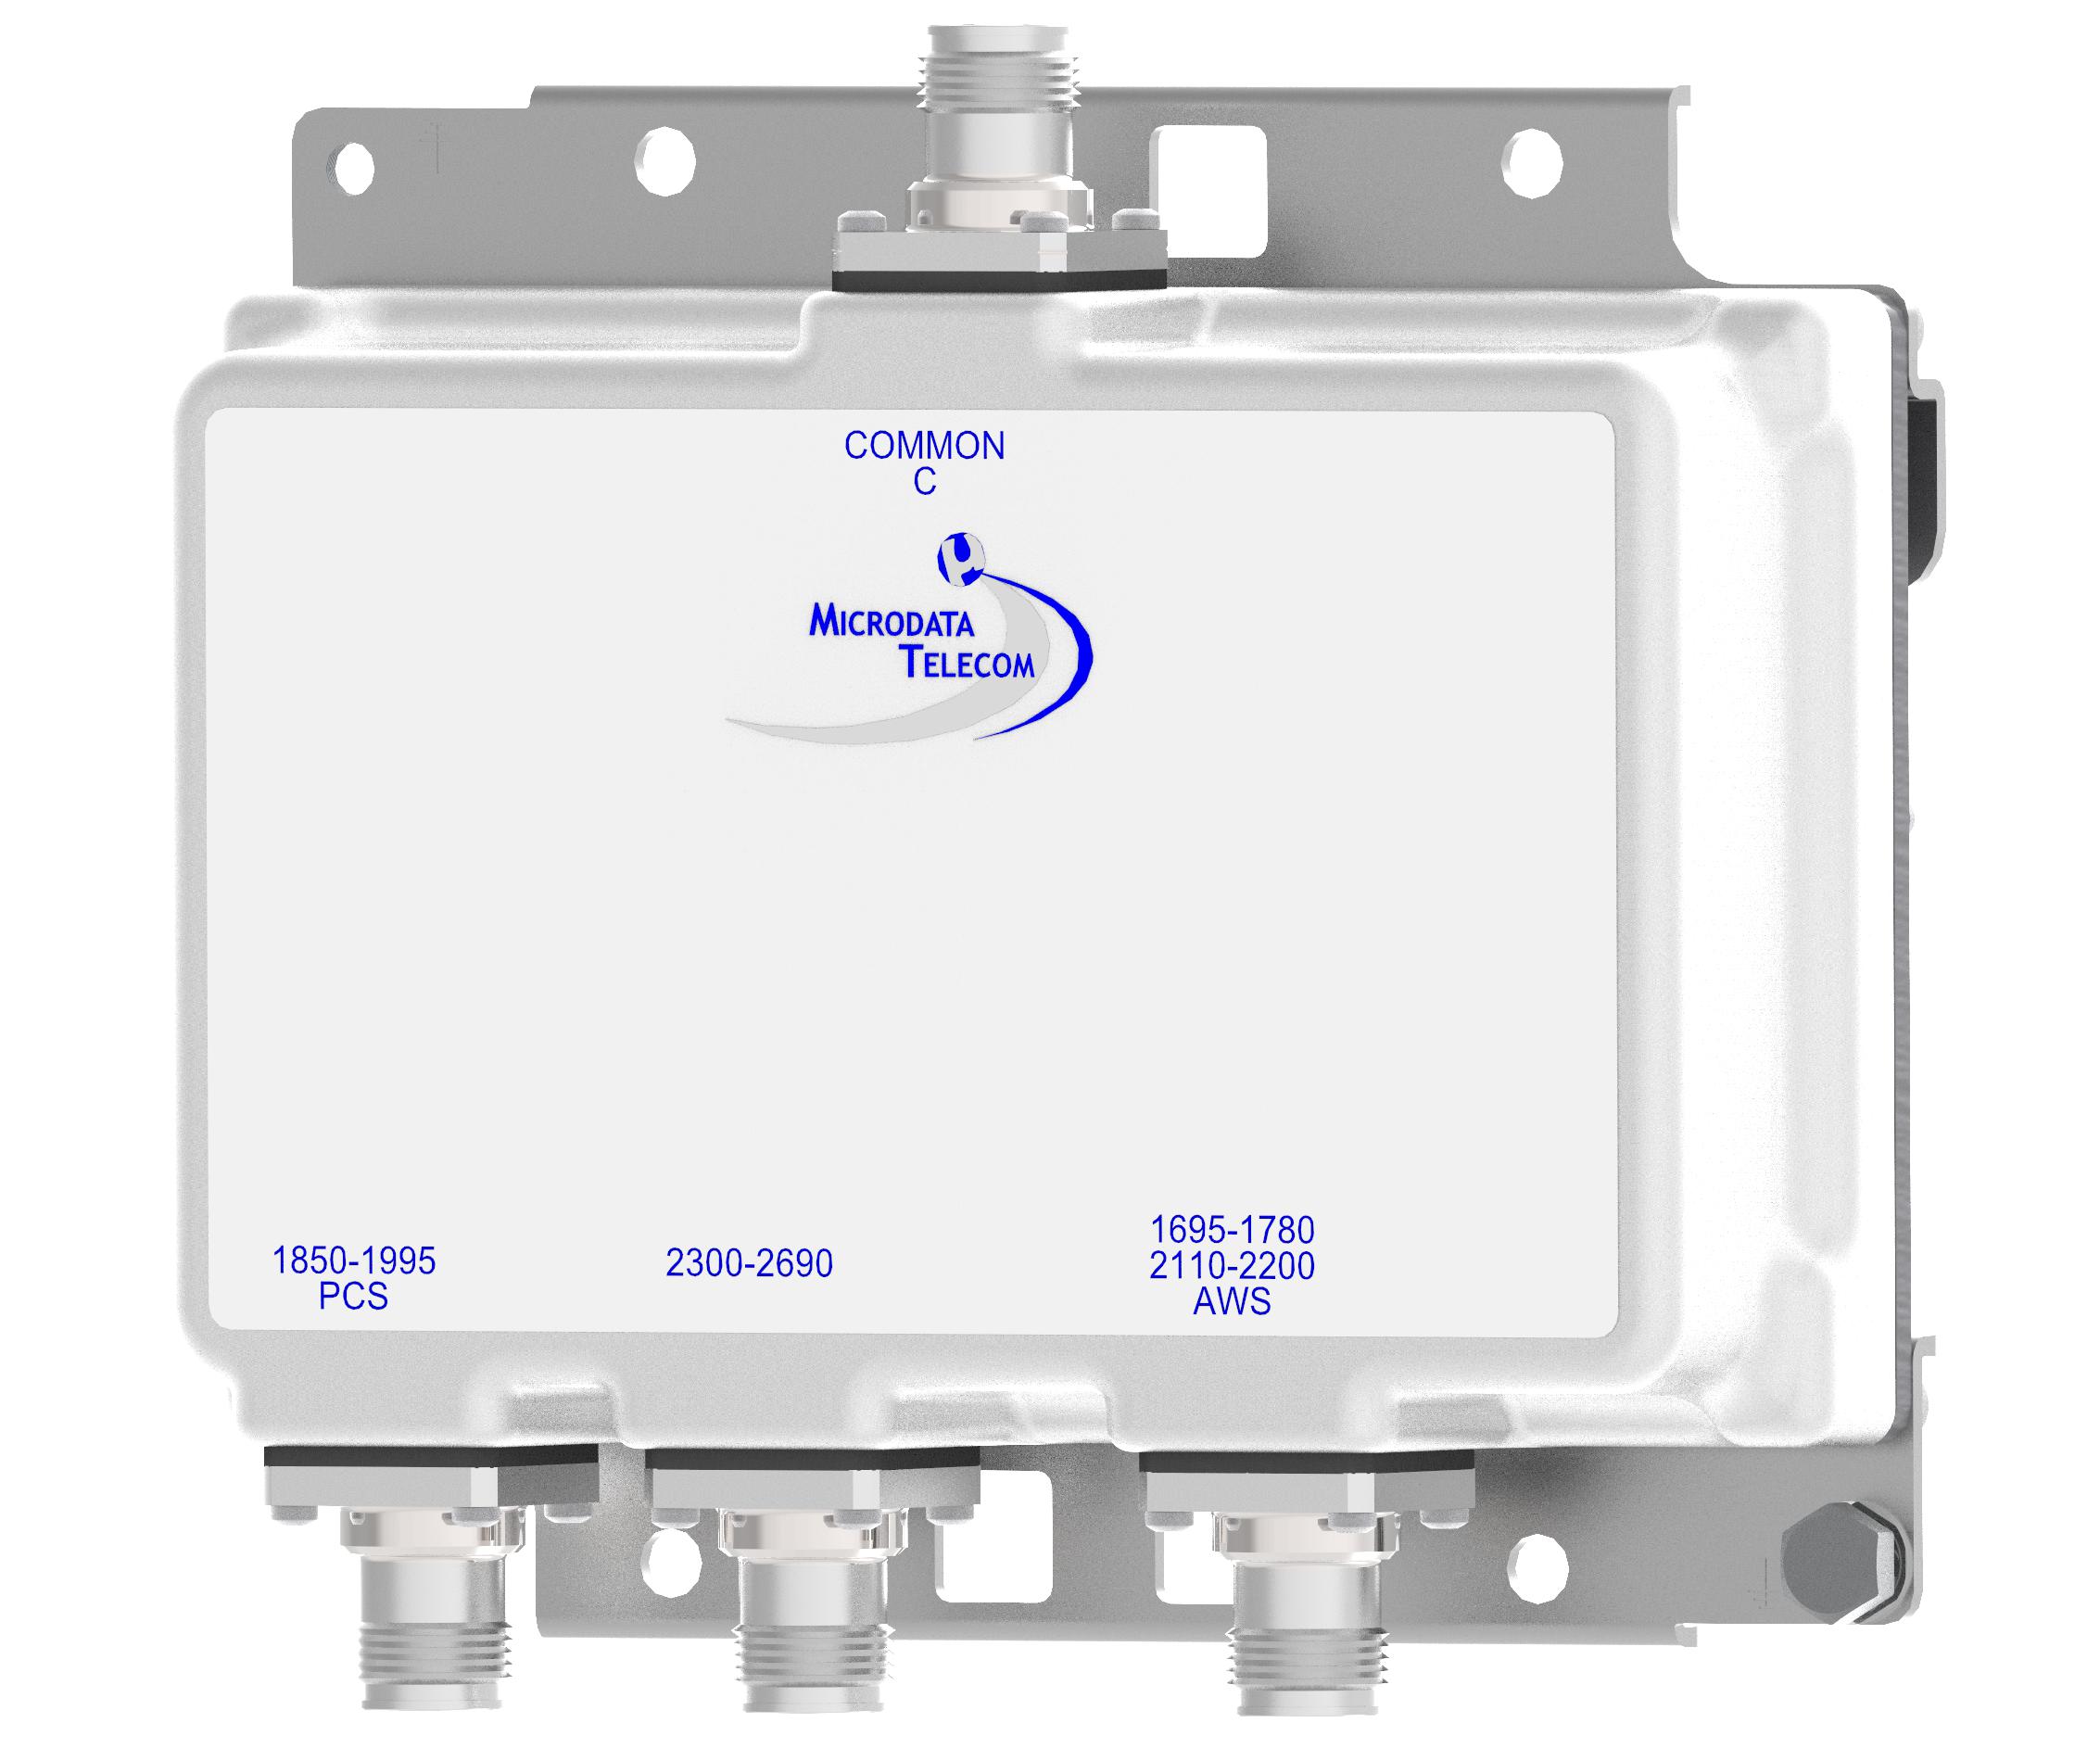 Triplexer AWS/PCS/2300-2600 MHz - Microdata Telecom